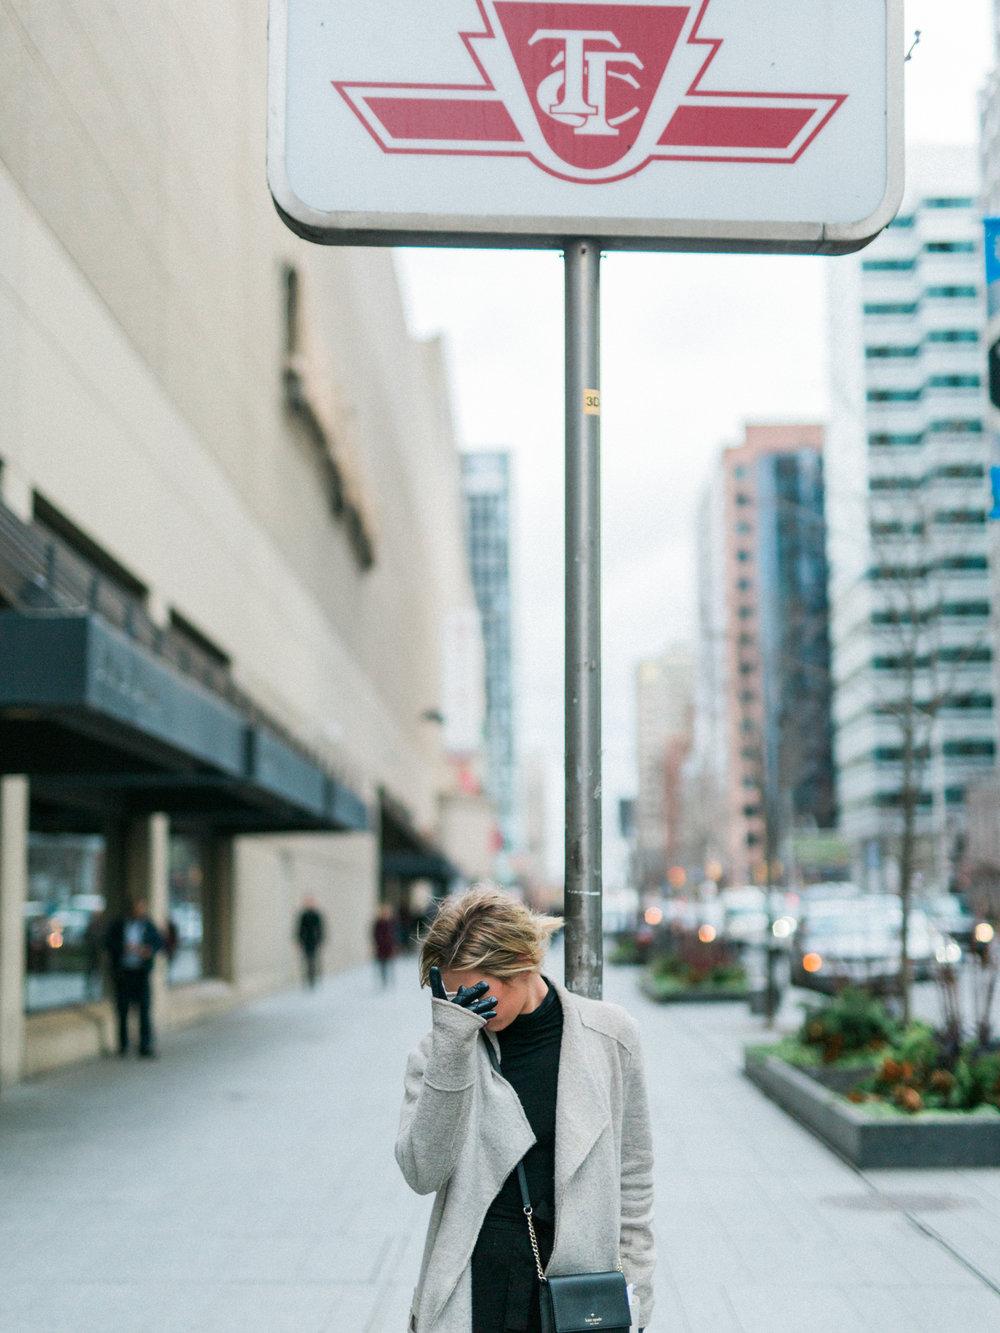 DanielleGirouxPhotography_Toronto_Portrait_StreetPhotography_0C6A1238.jpg